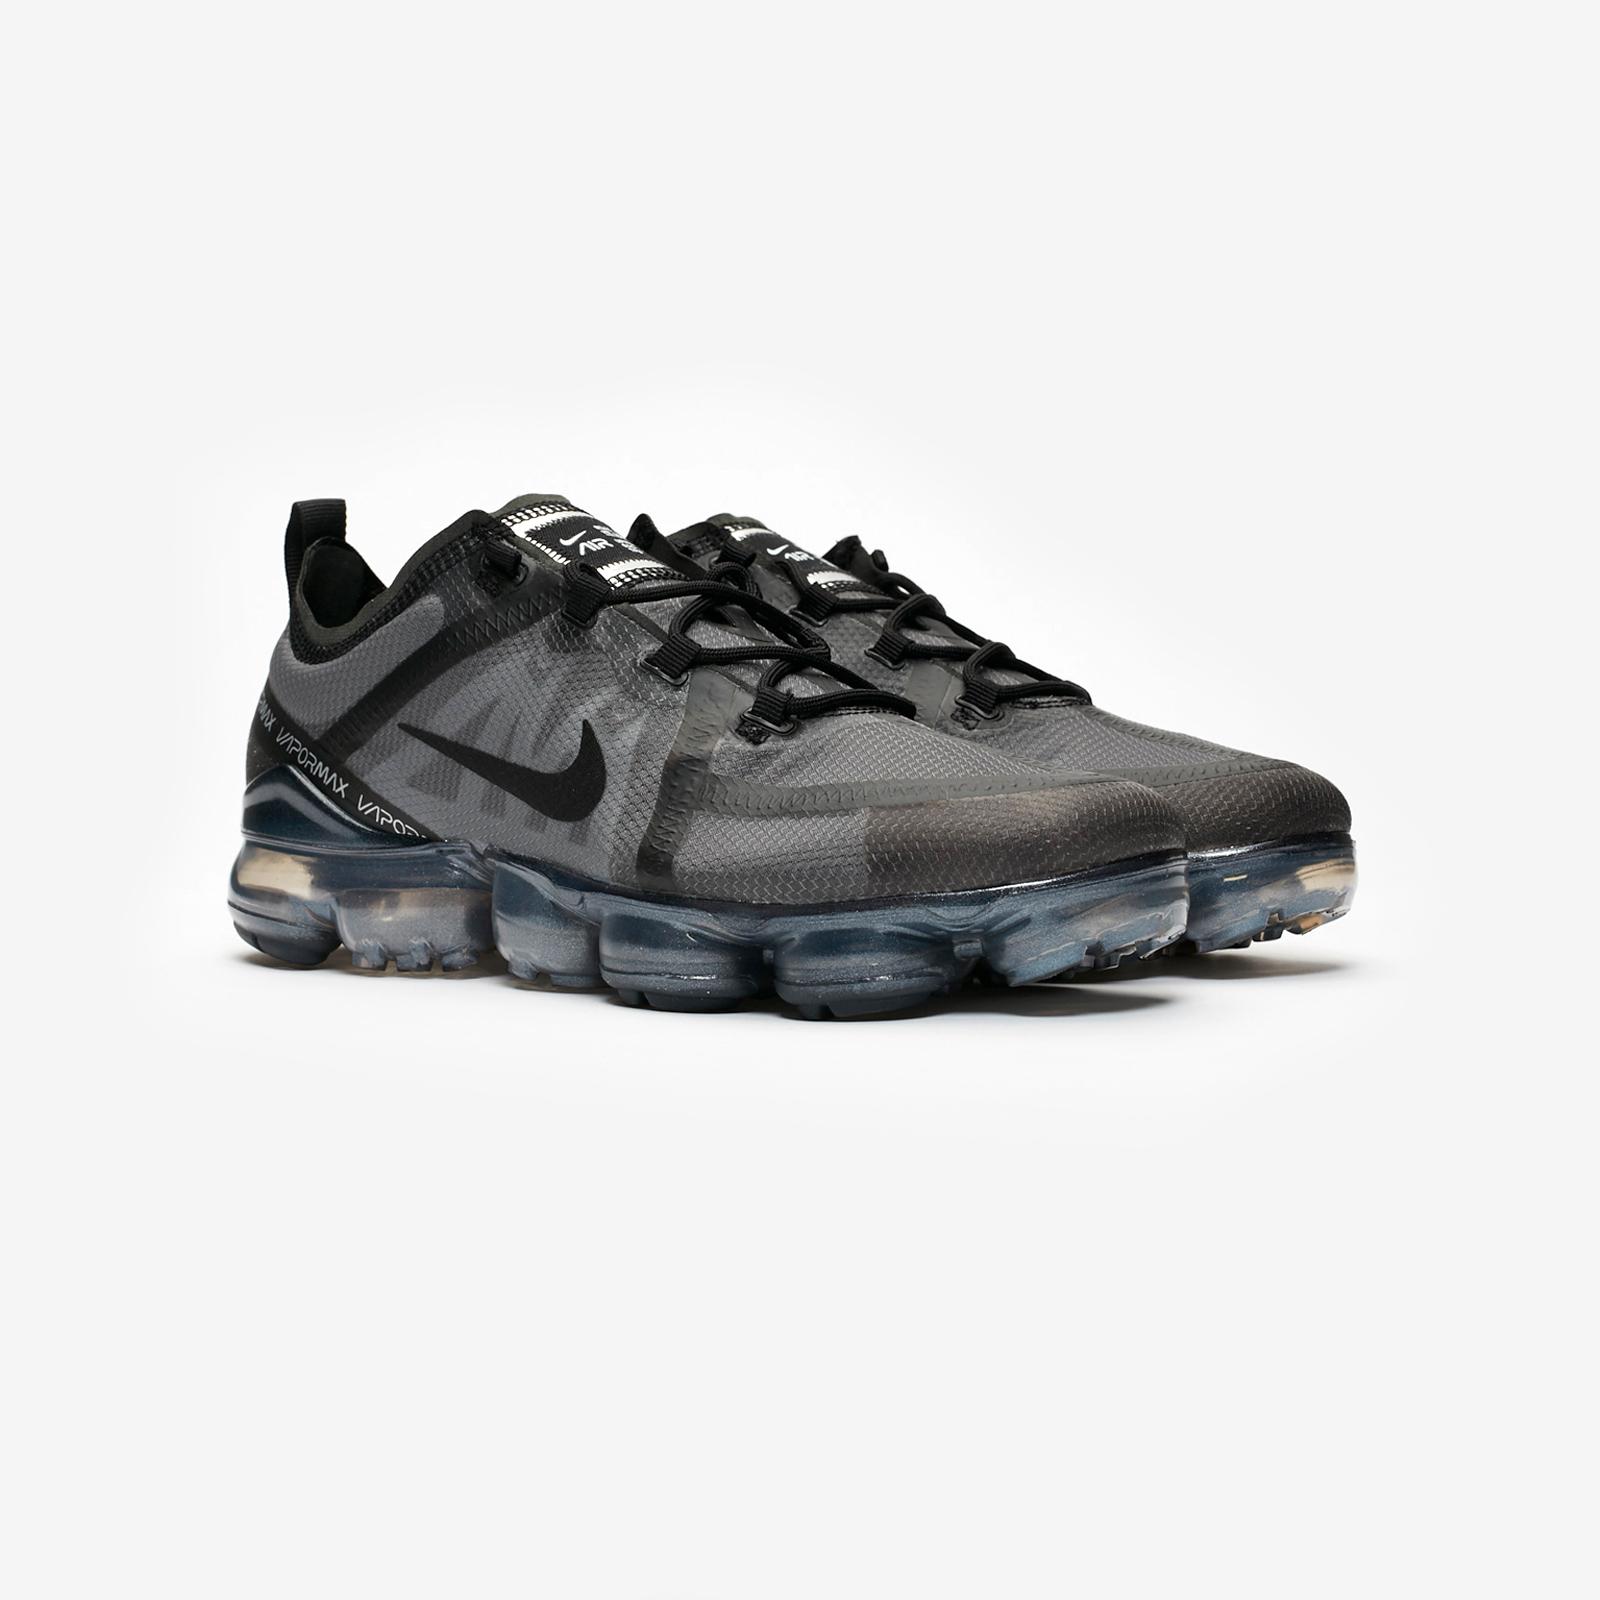 5965c184ac67 Nike Air Vapormax 2019 - Ar6631-004 - Sneakersnstuff